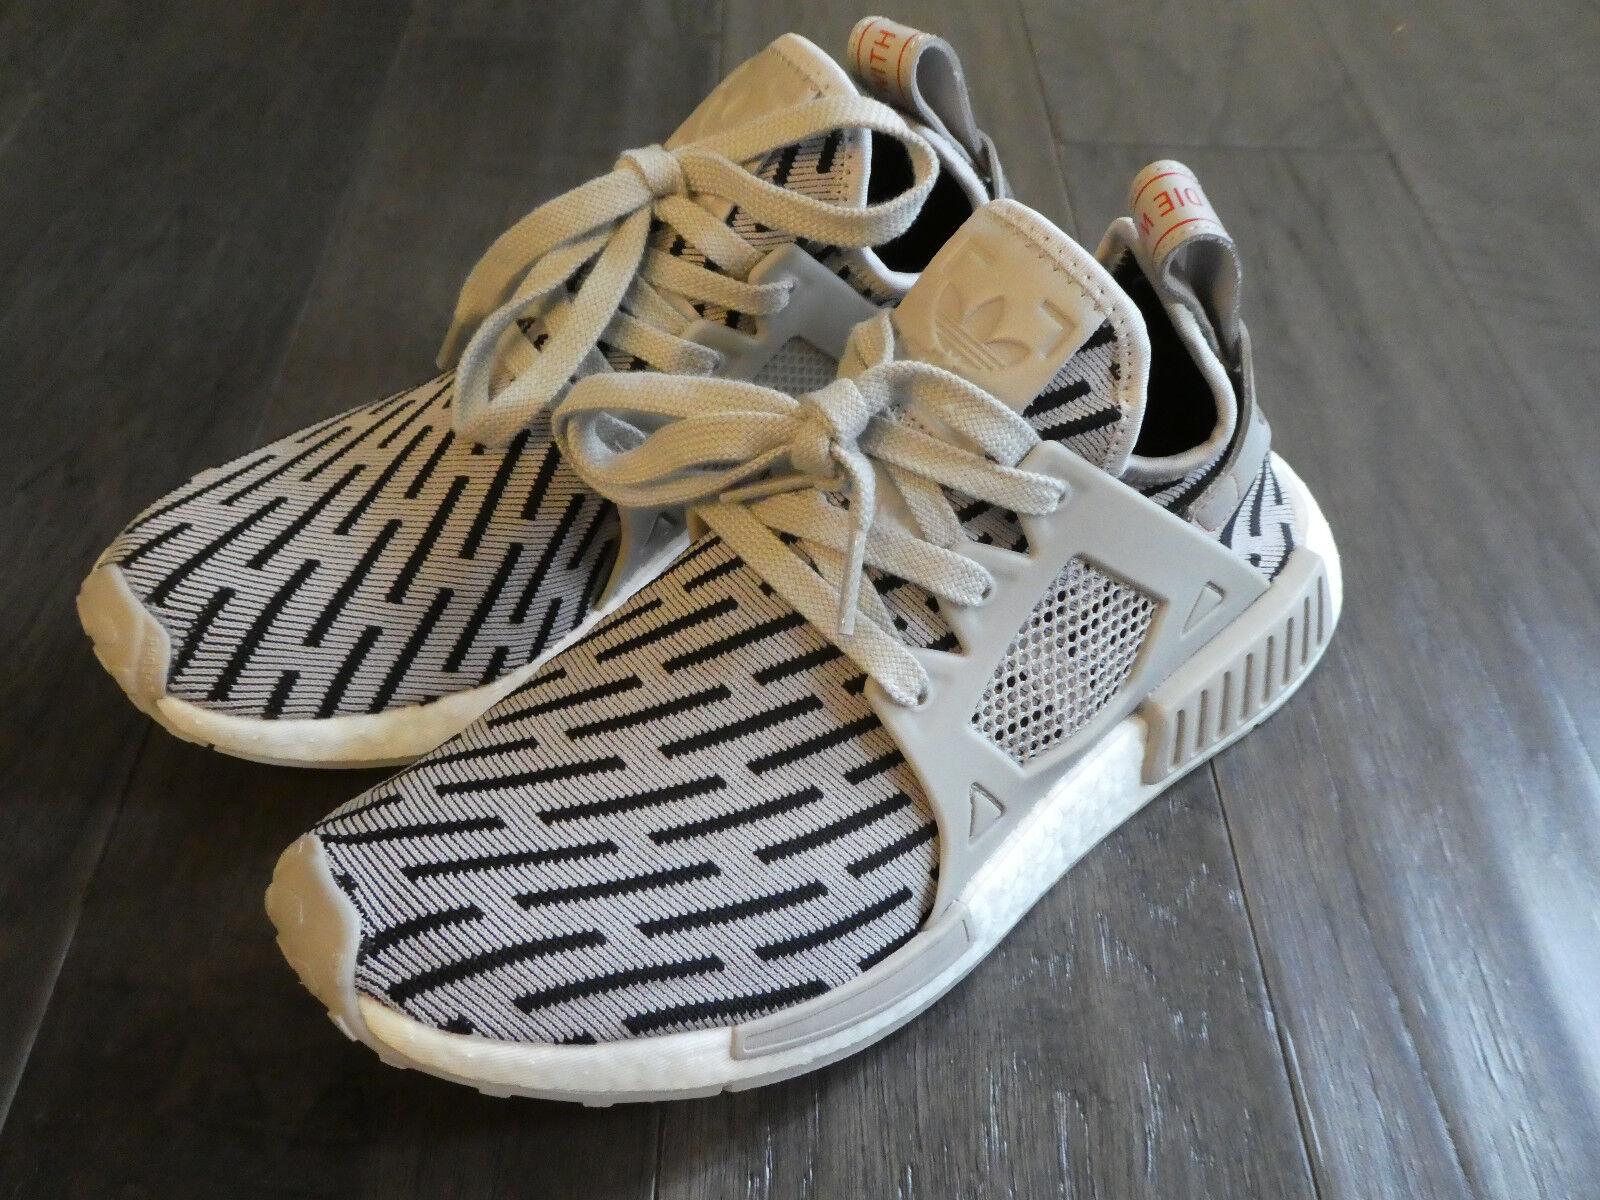 Adidas Womens NMD_XR1 PK Primeknit Boost shoes sneakers new BB2376 Granite